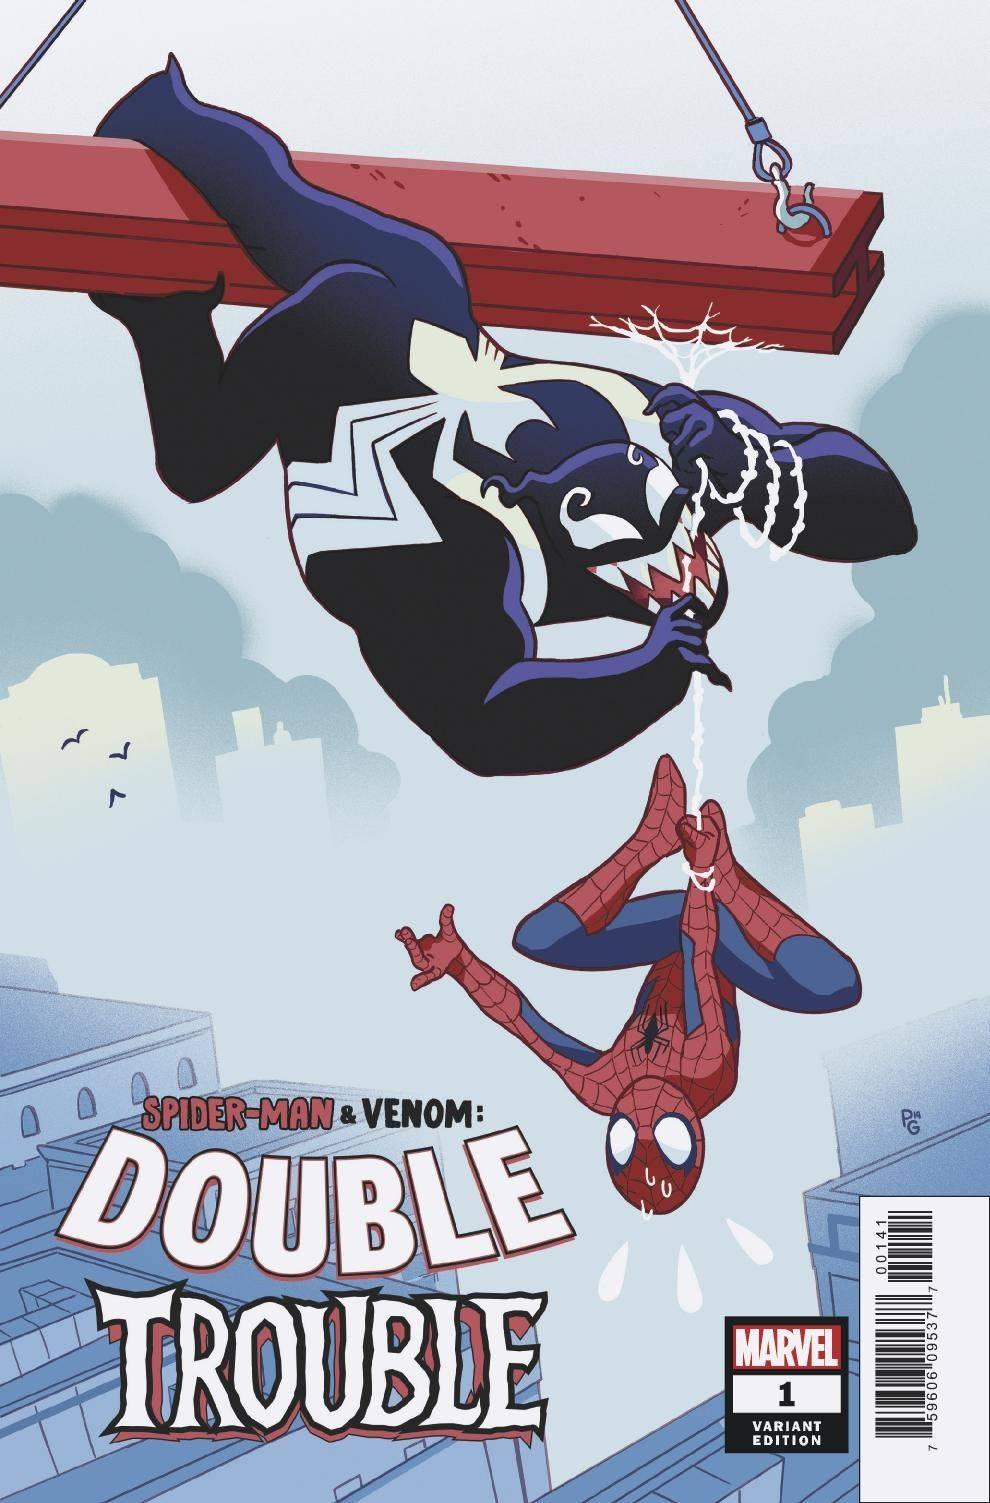 Spider-Man & Venom: Double Trouble #1 (2019)